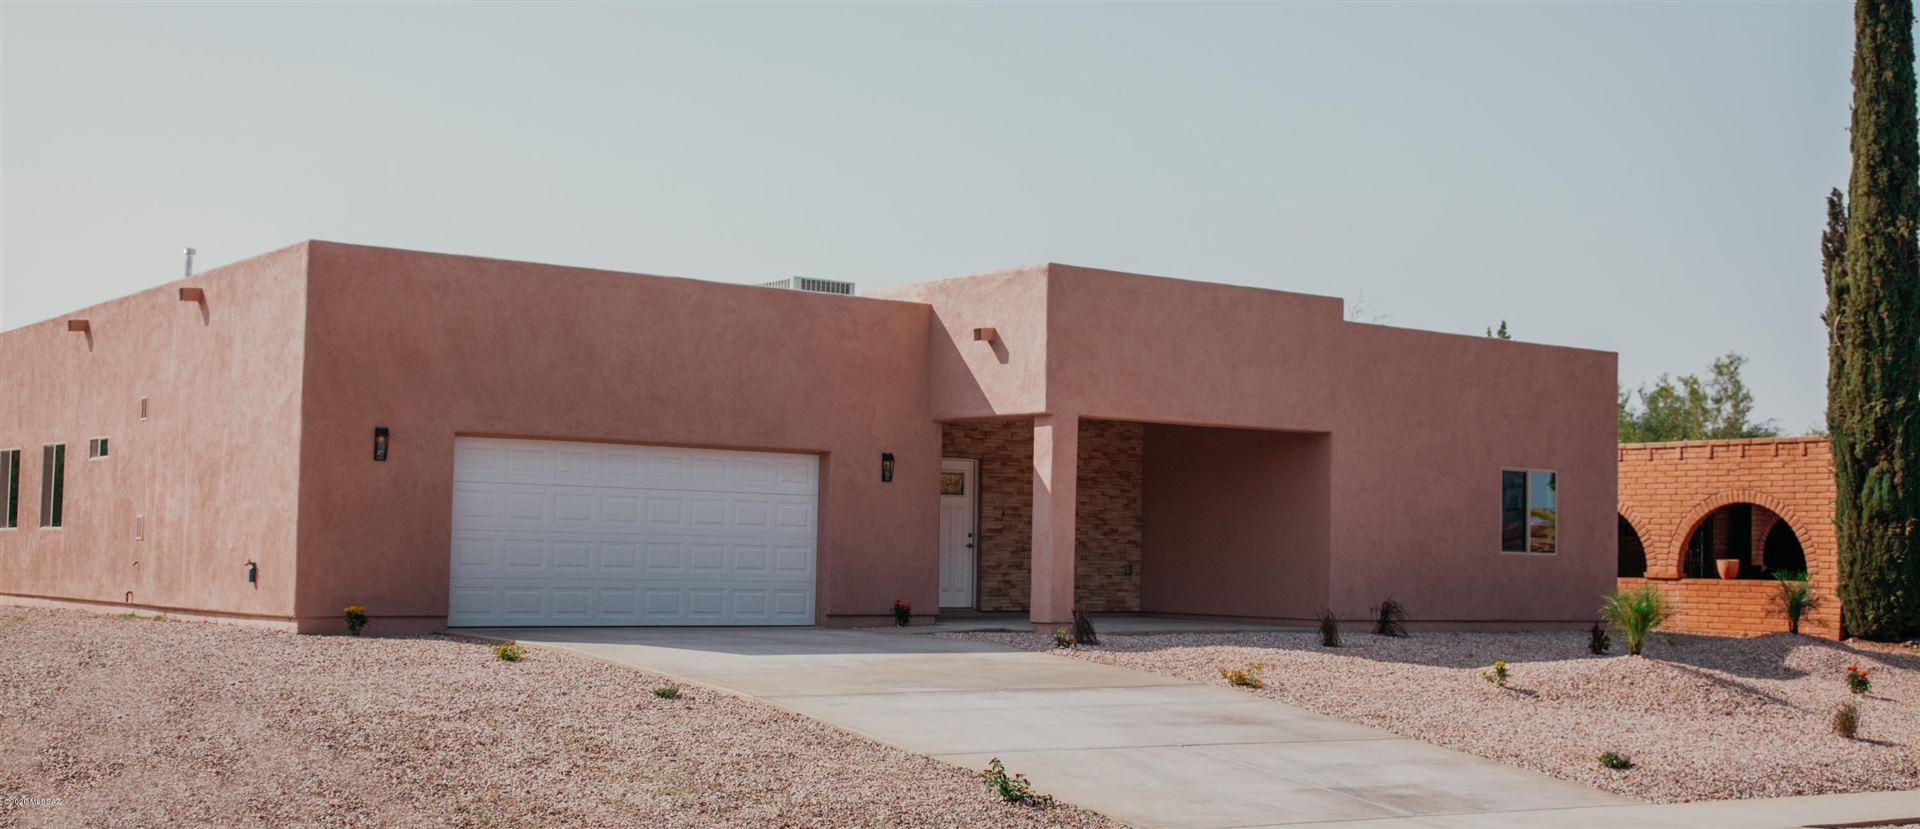 1211 N Paseo Maravilloso, Green Valley, AZ 85614 - MLS#: 22015572